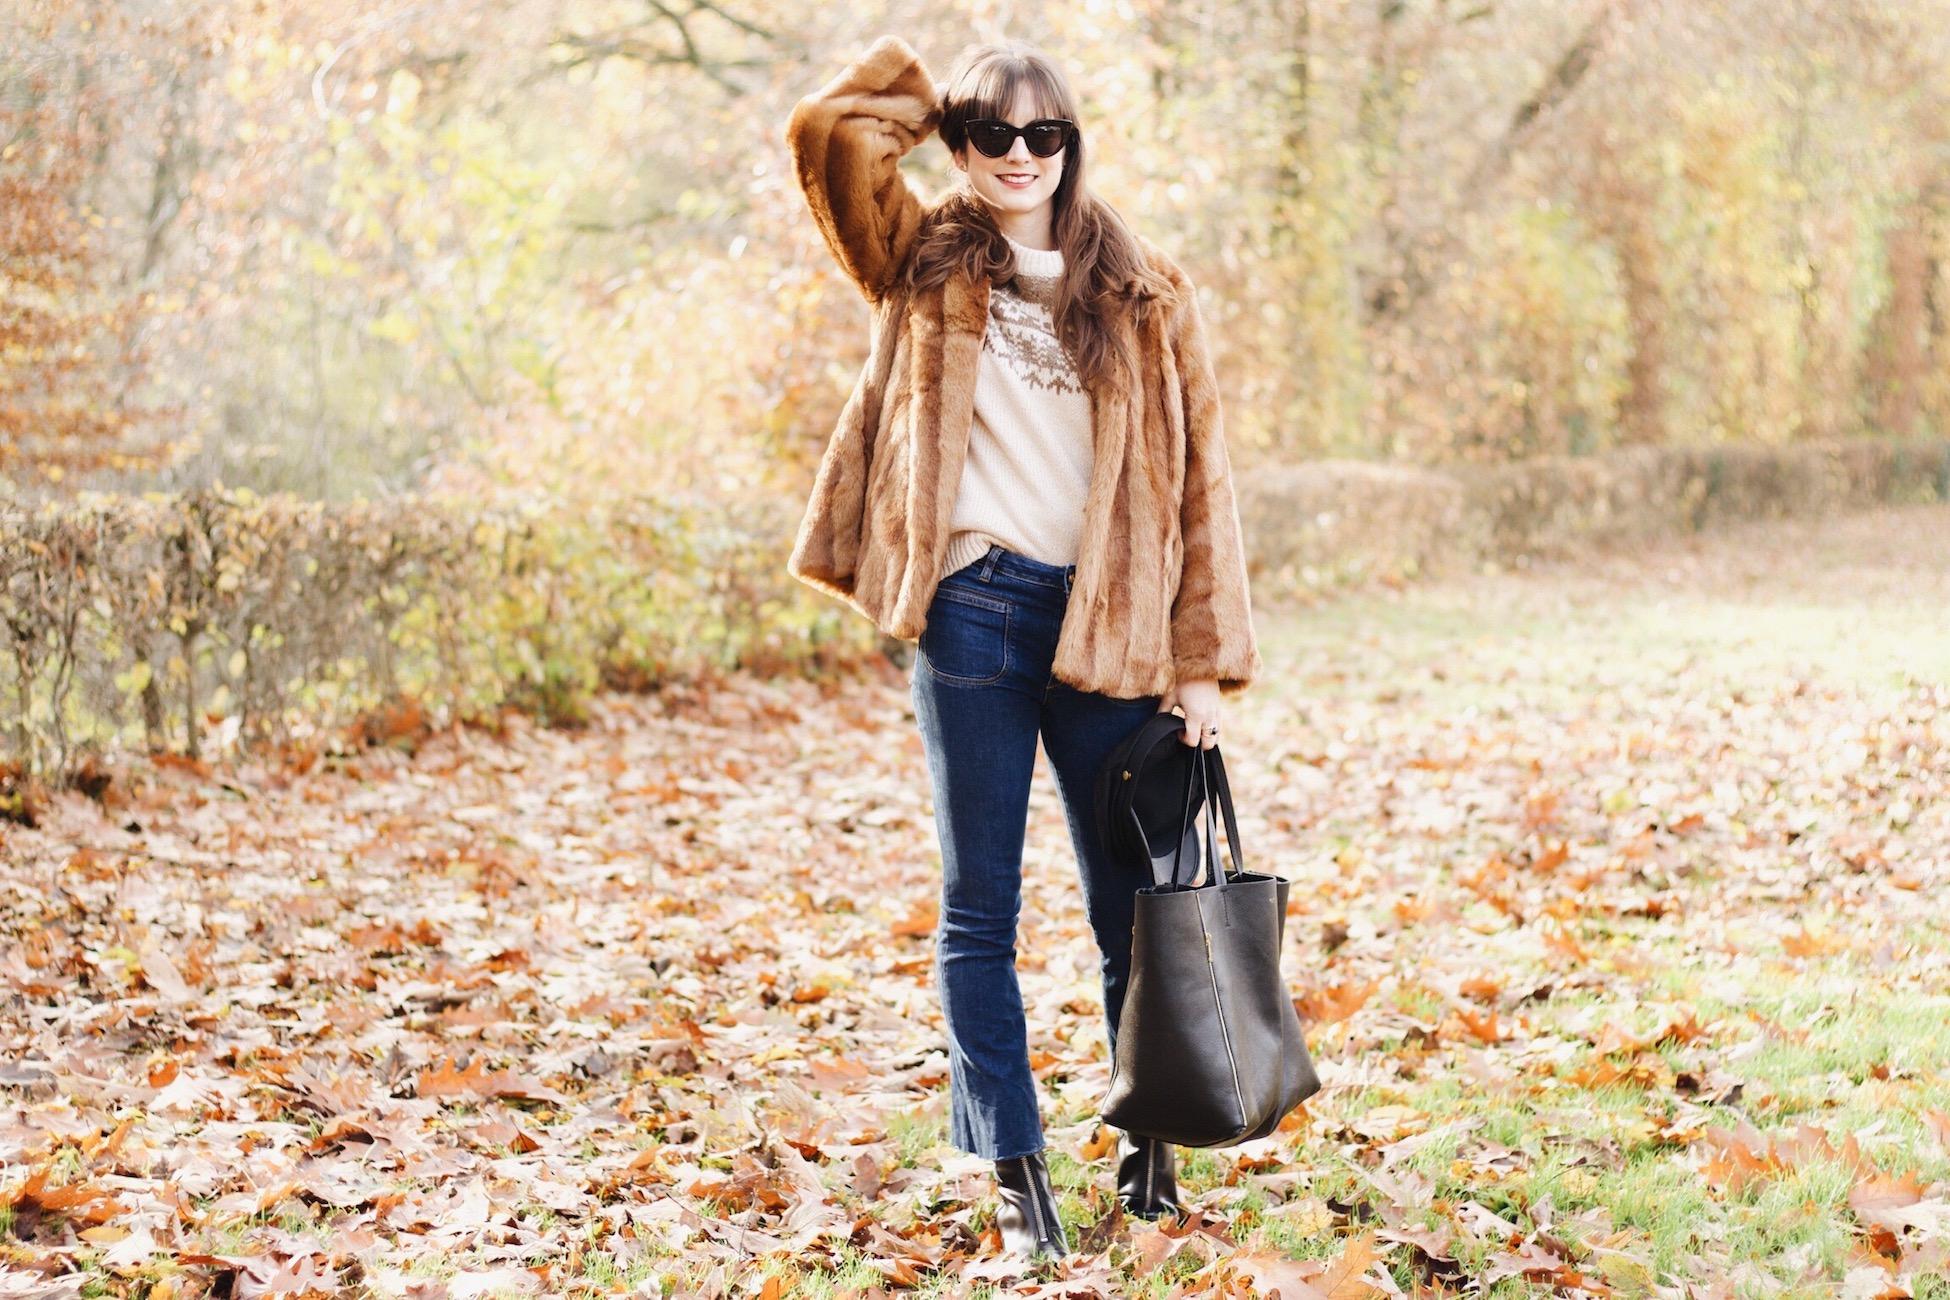 Modeblog Fashion Post Pelzjacke Fake Fur Céline Cabas Bag und Kick Flare Jeans